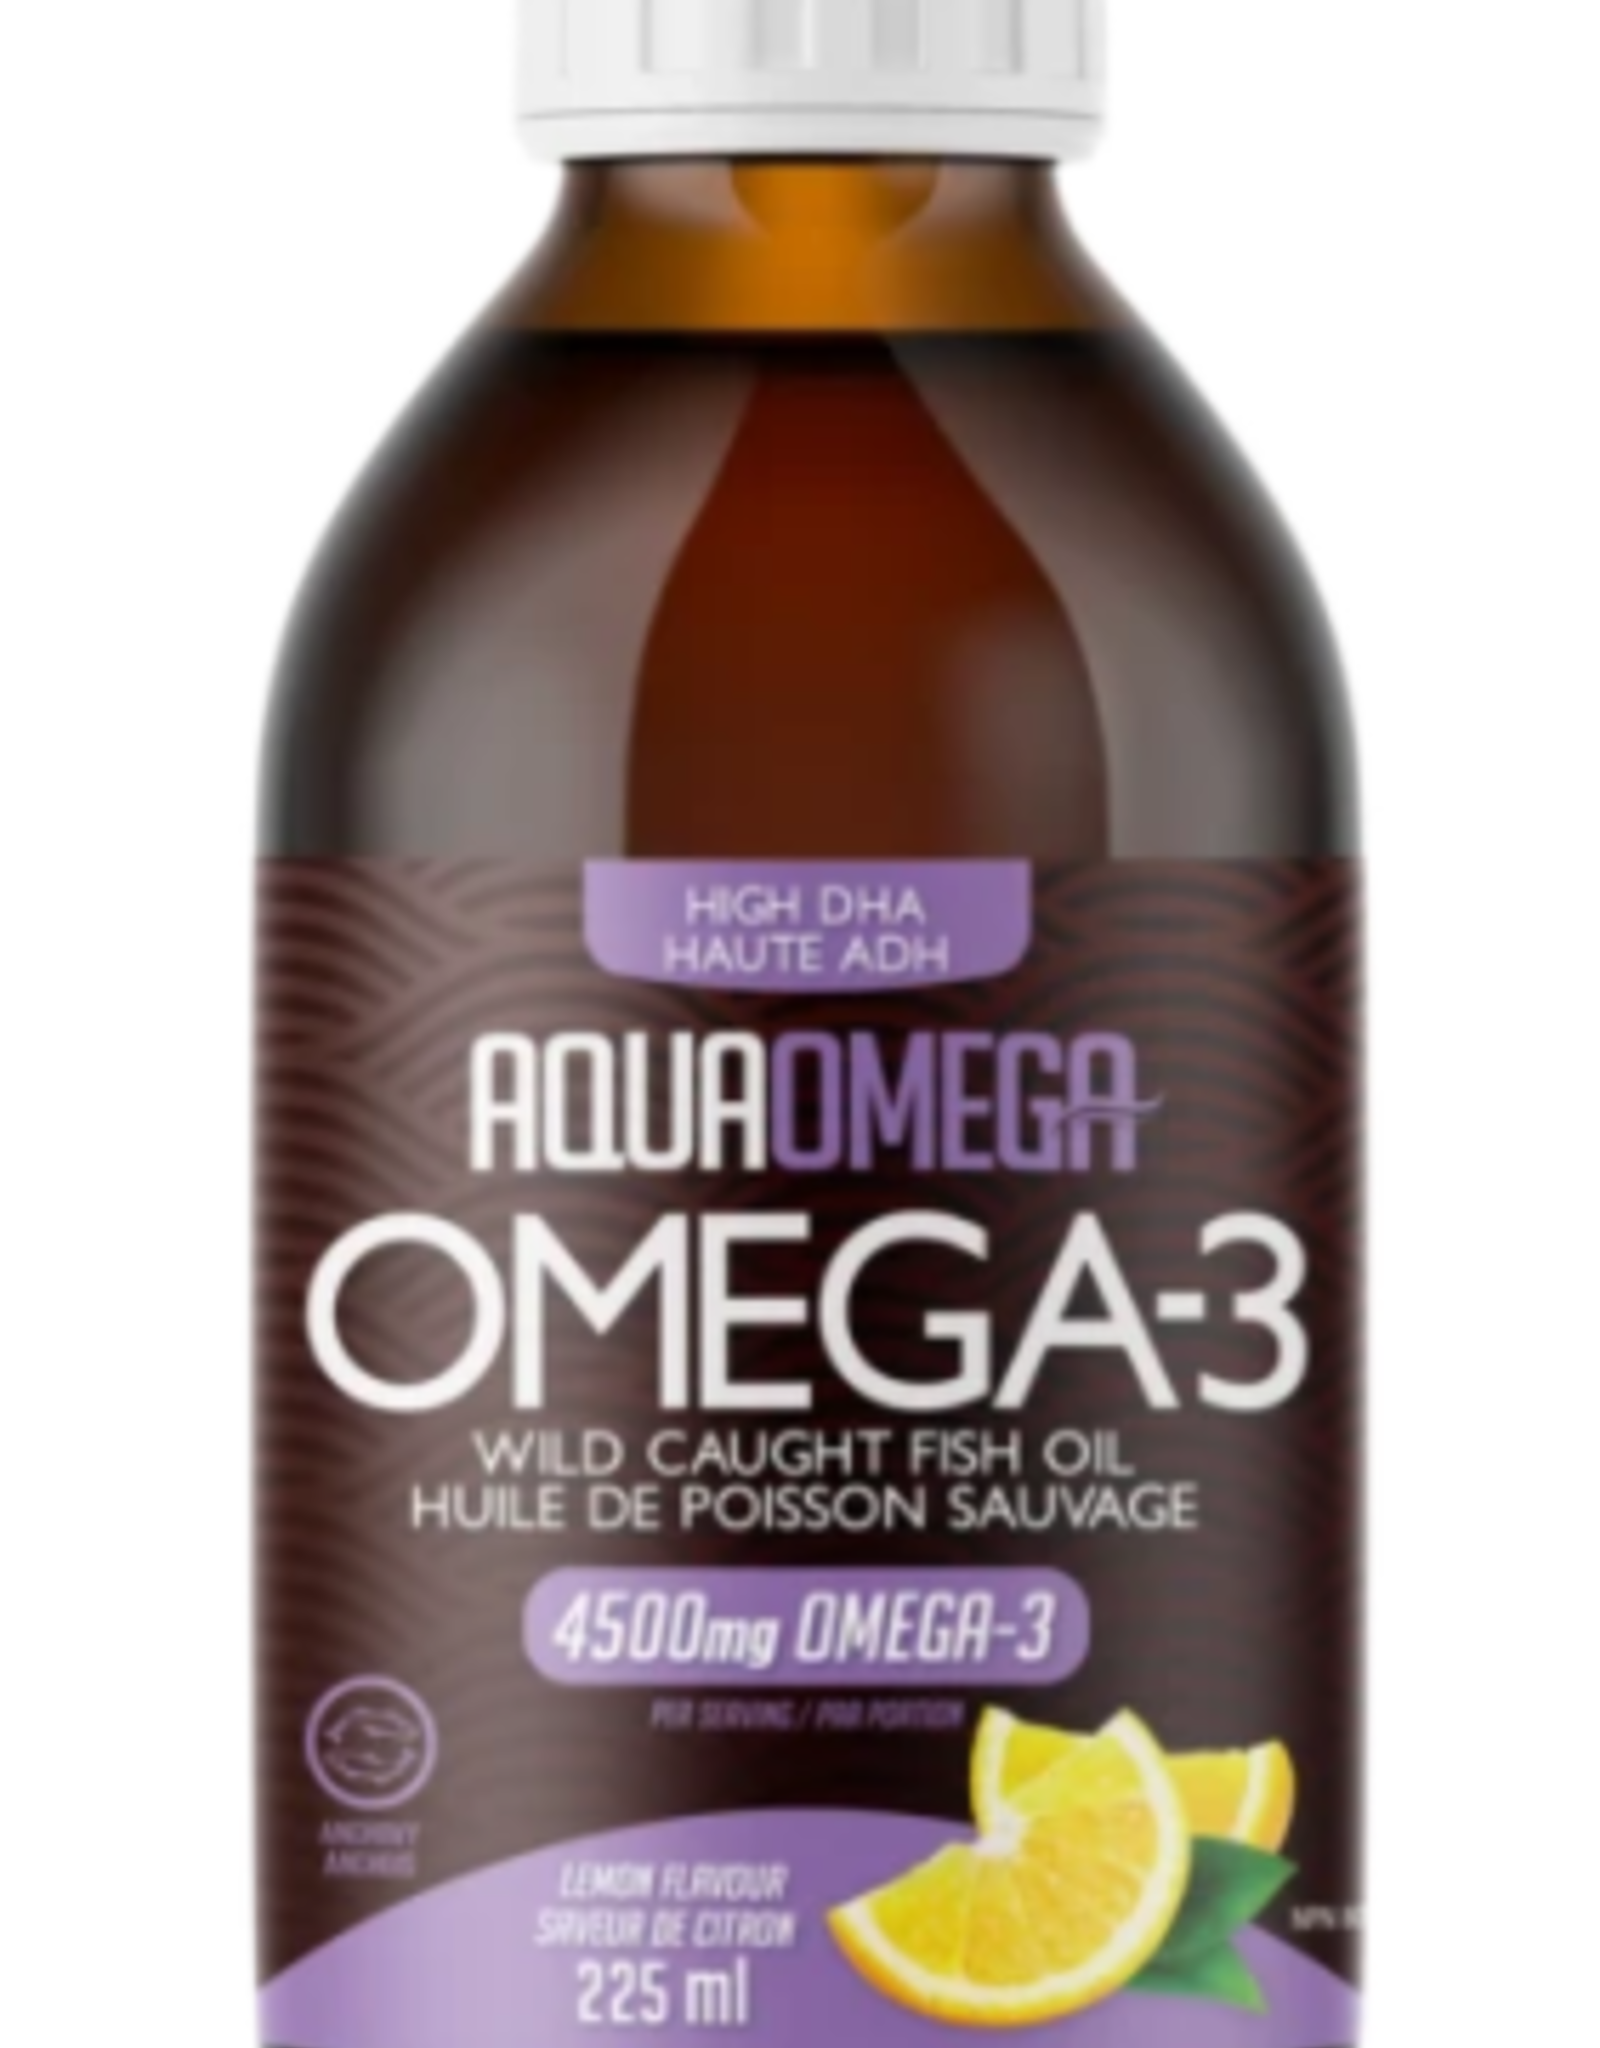 Aqua Omega 1:5 High DHA Lemon (225ml)